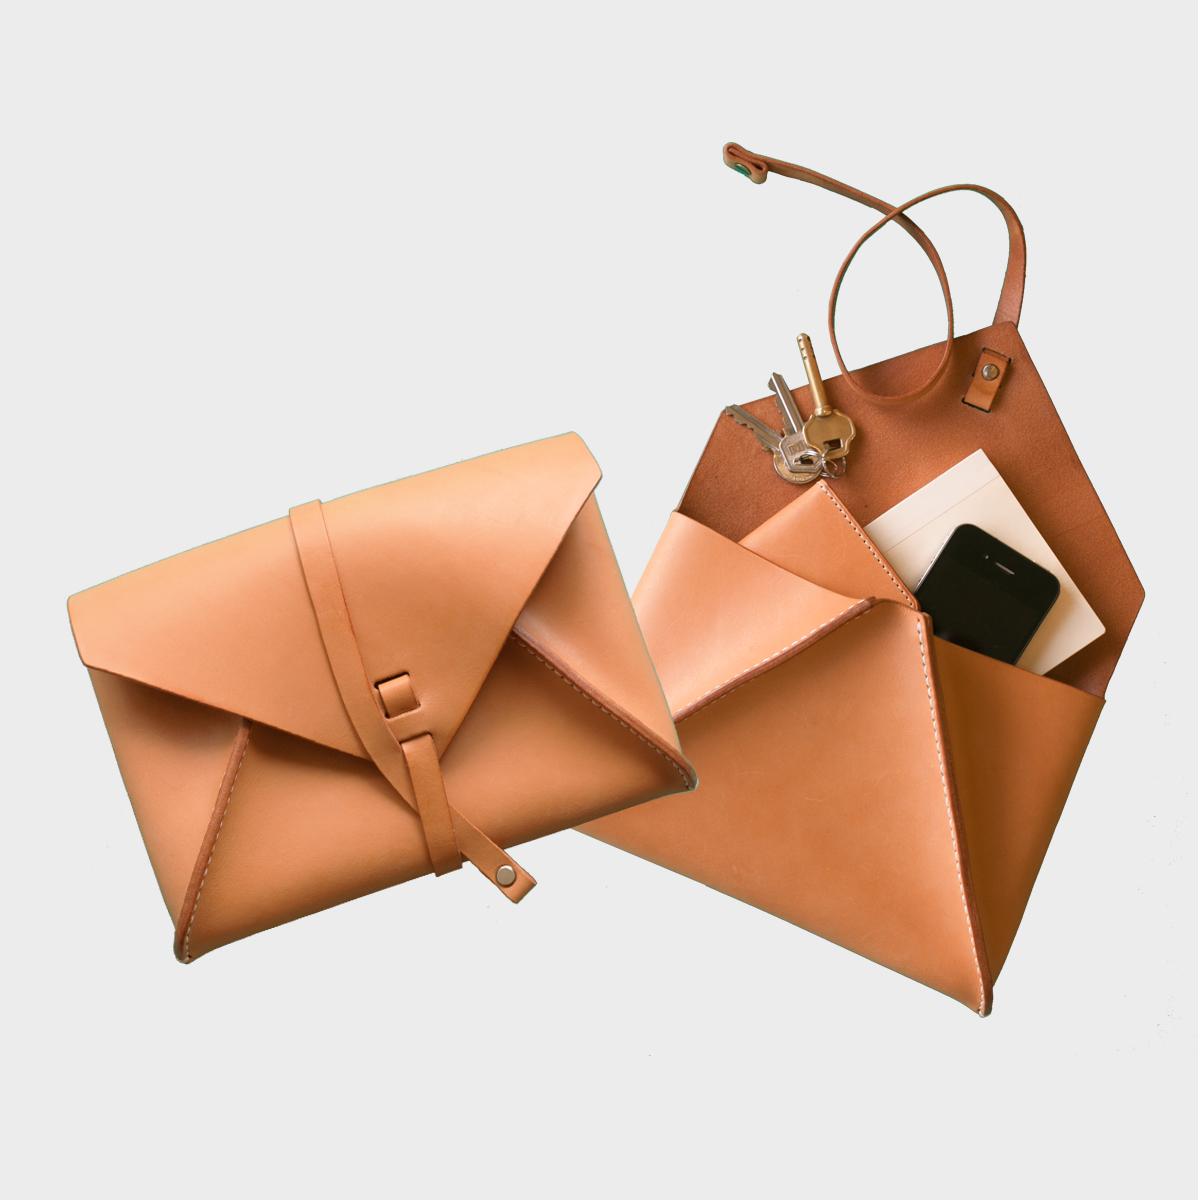 信封包Envelope Case NT$ 4280  HDA0011